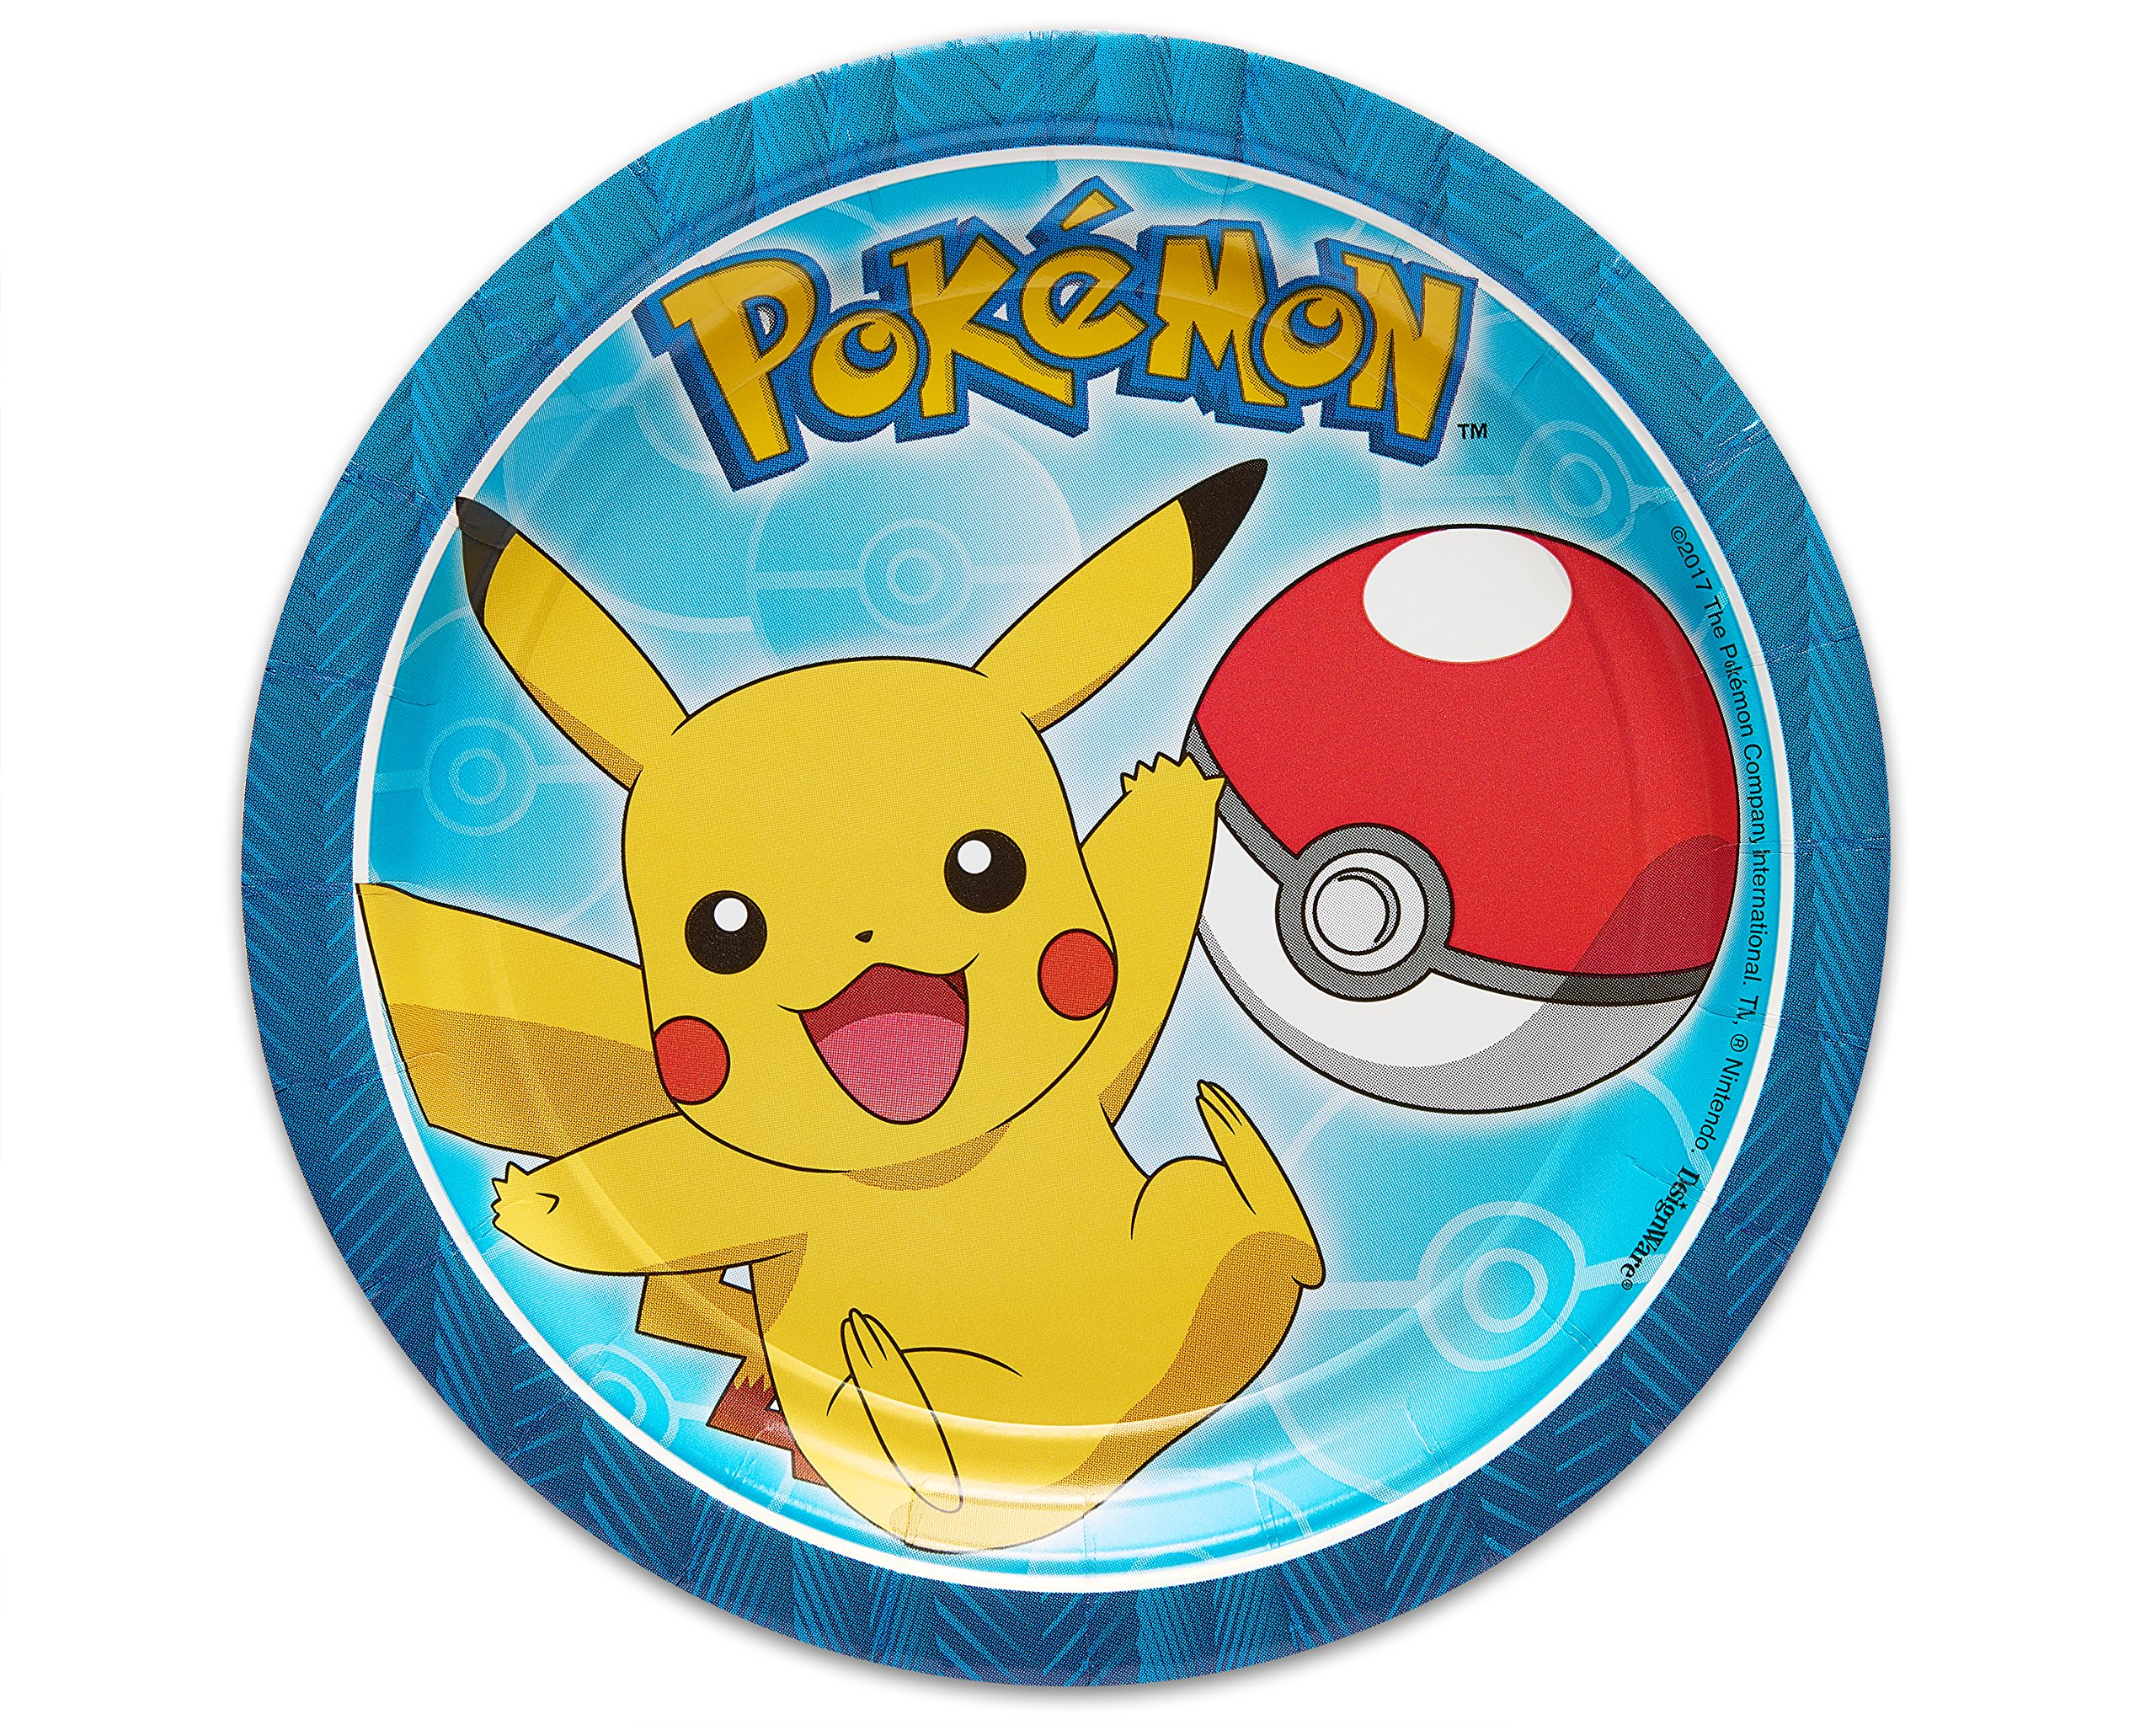 Amazon American Greetings Pokemon Invitations 8 Count Toys